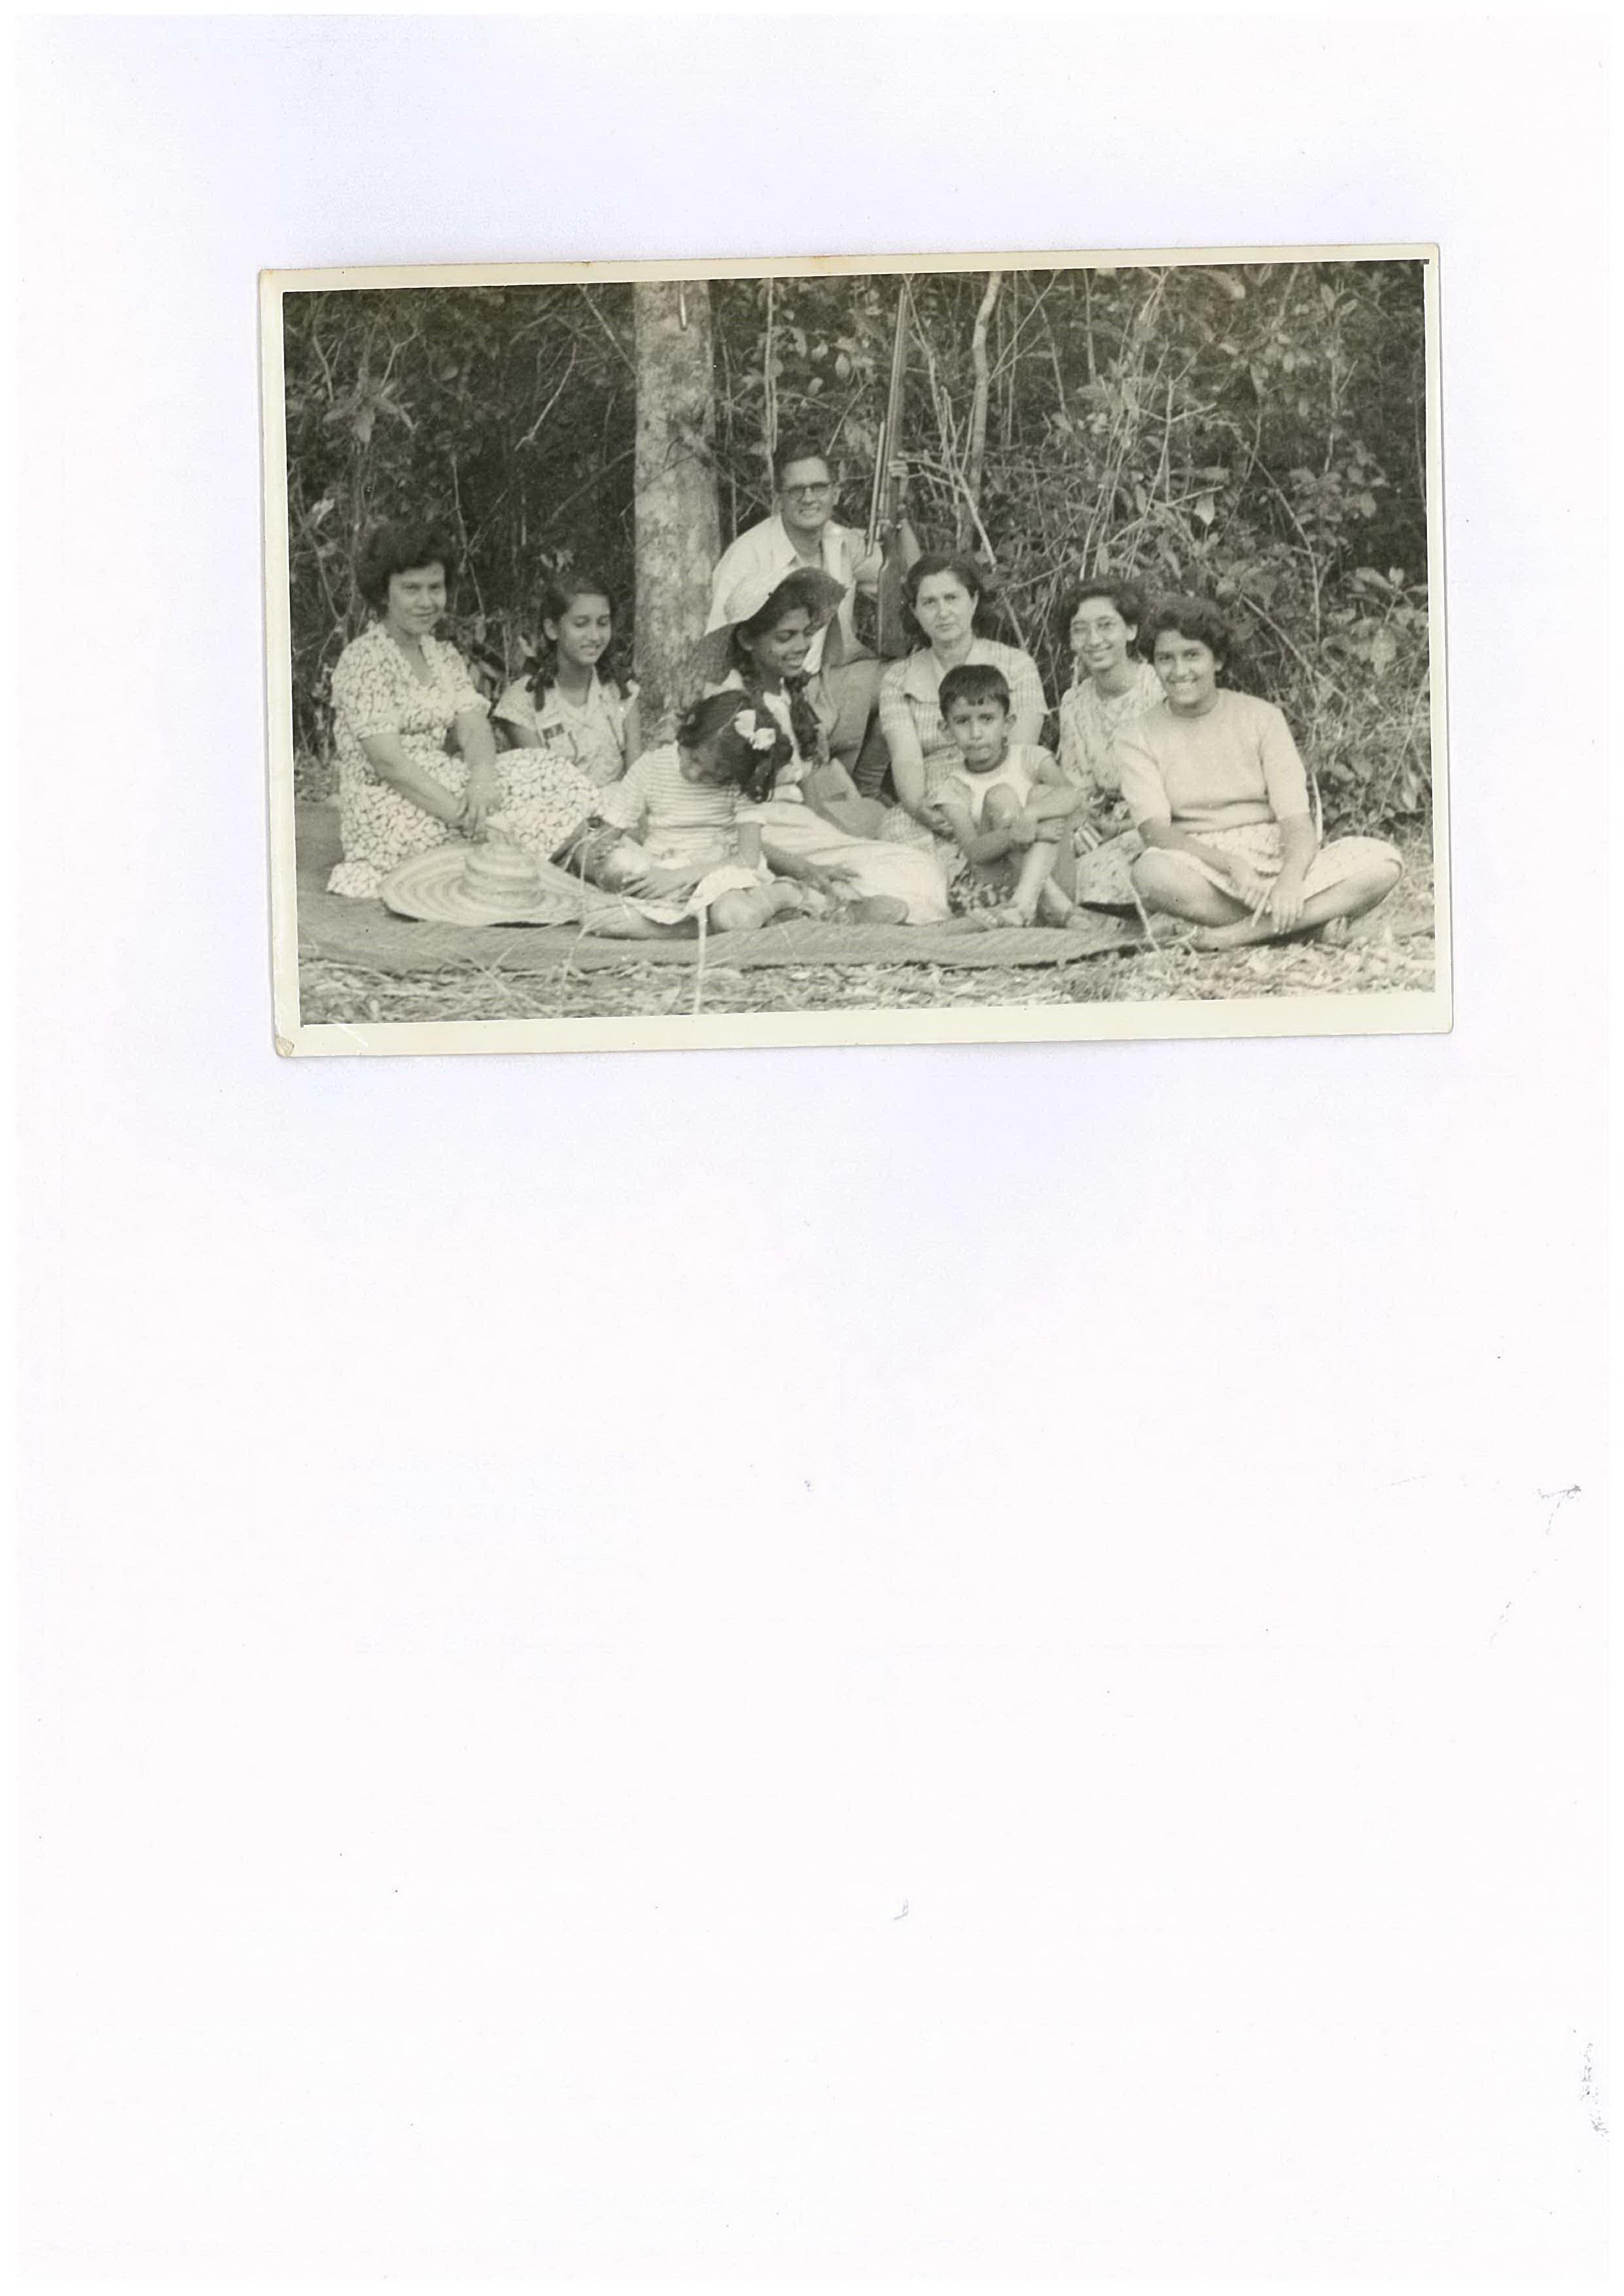 Cameron siblings having a picnic in sri lanka.jpg